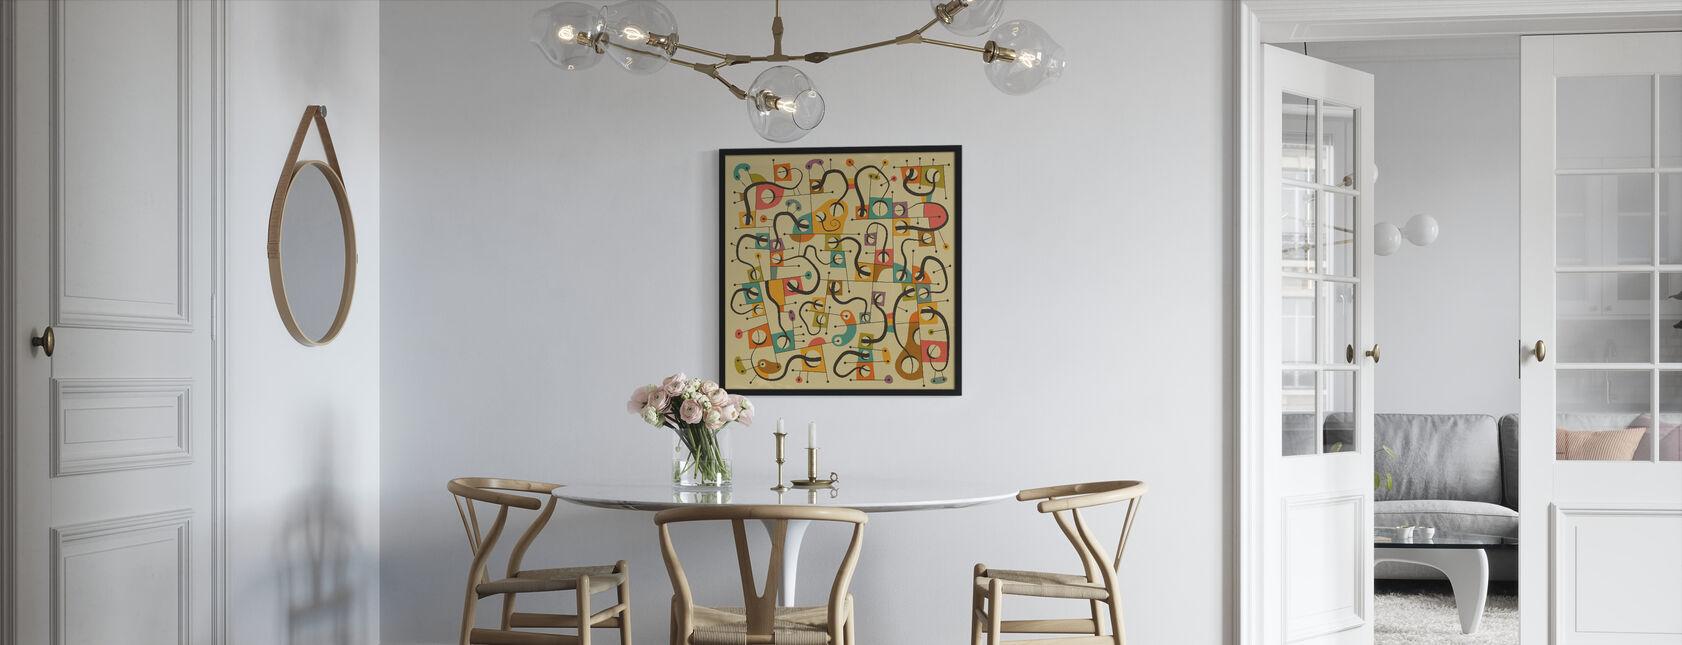 A Different World - Framed print - Kitchen